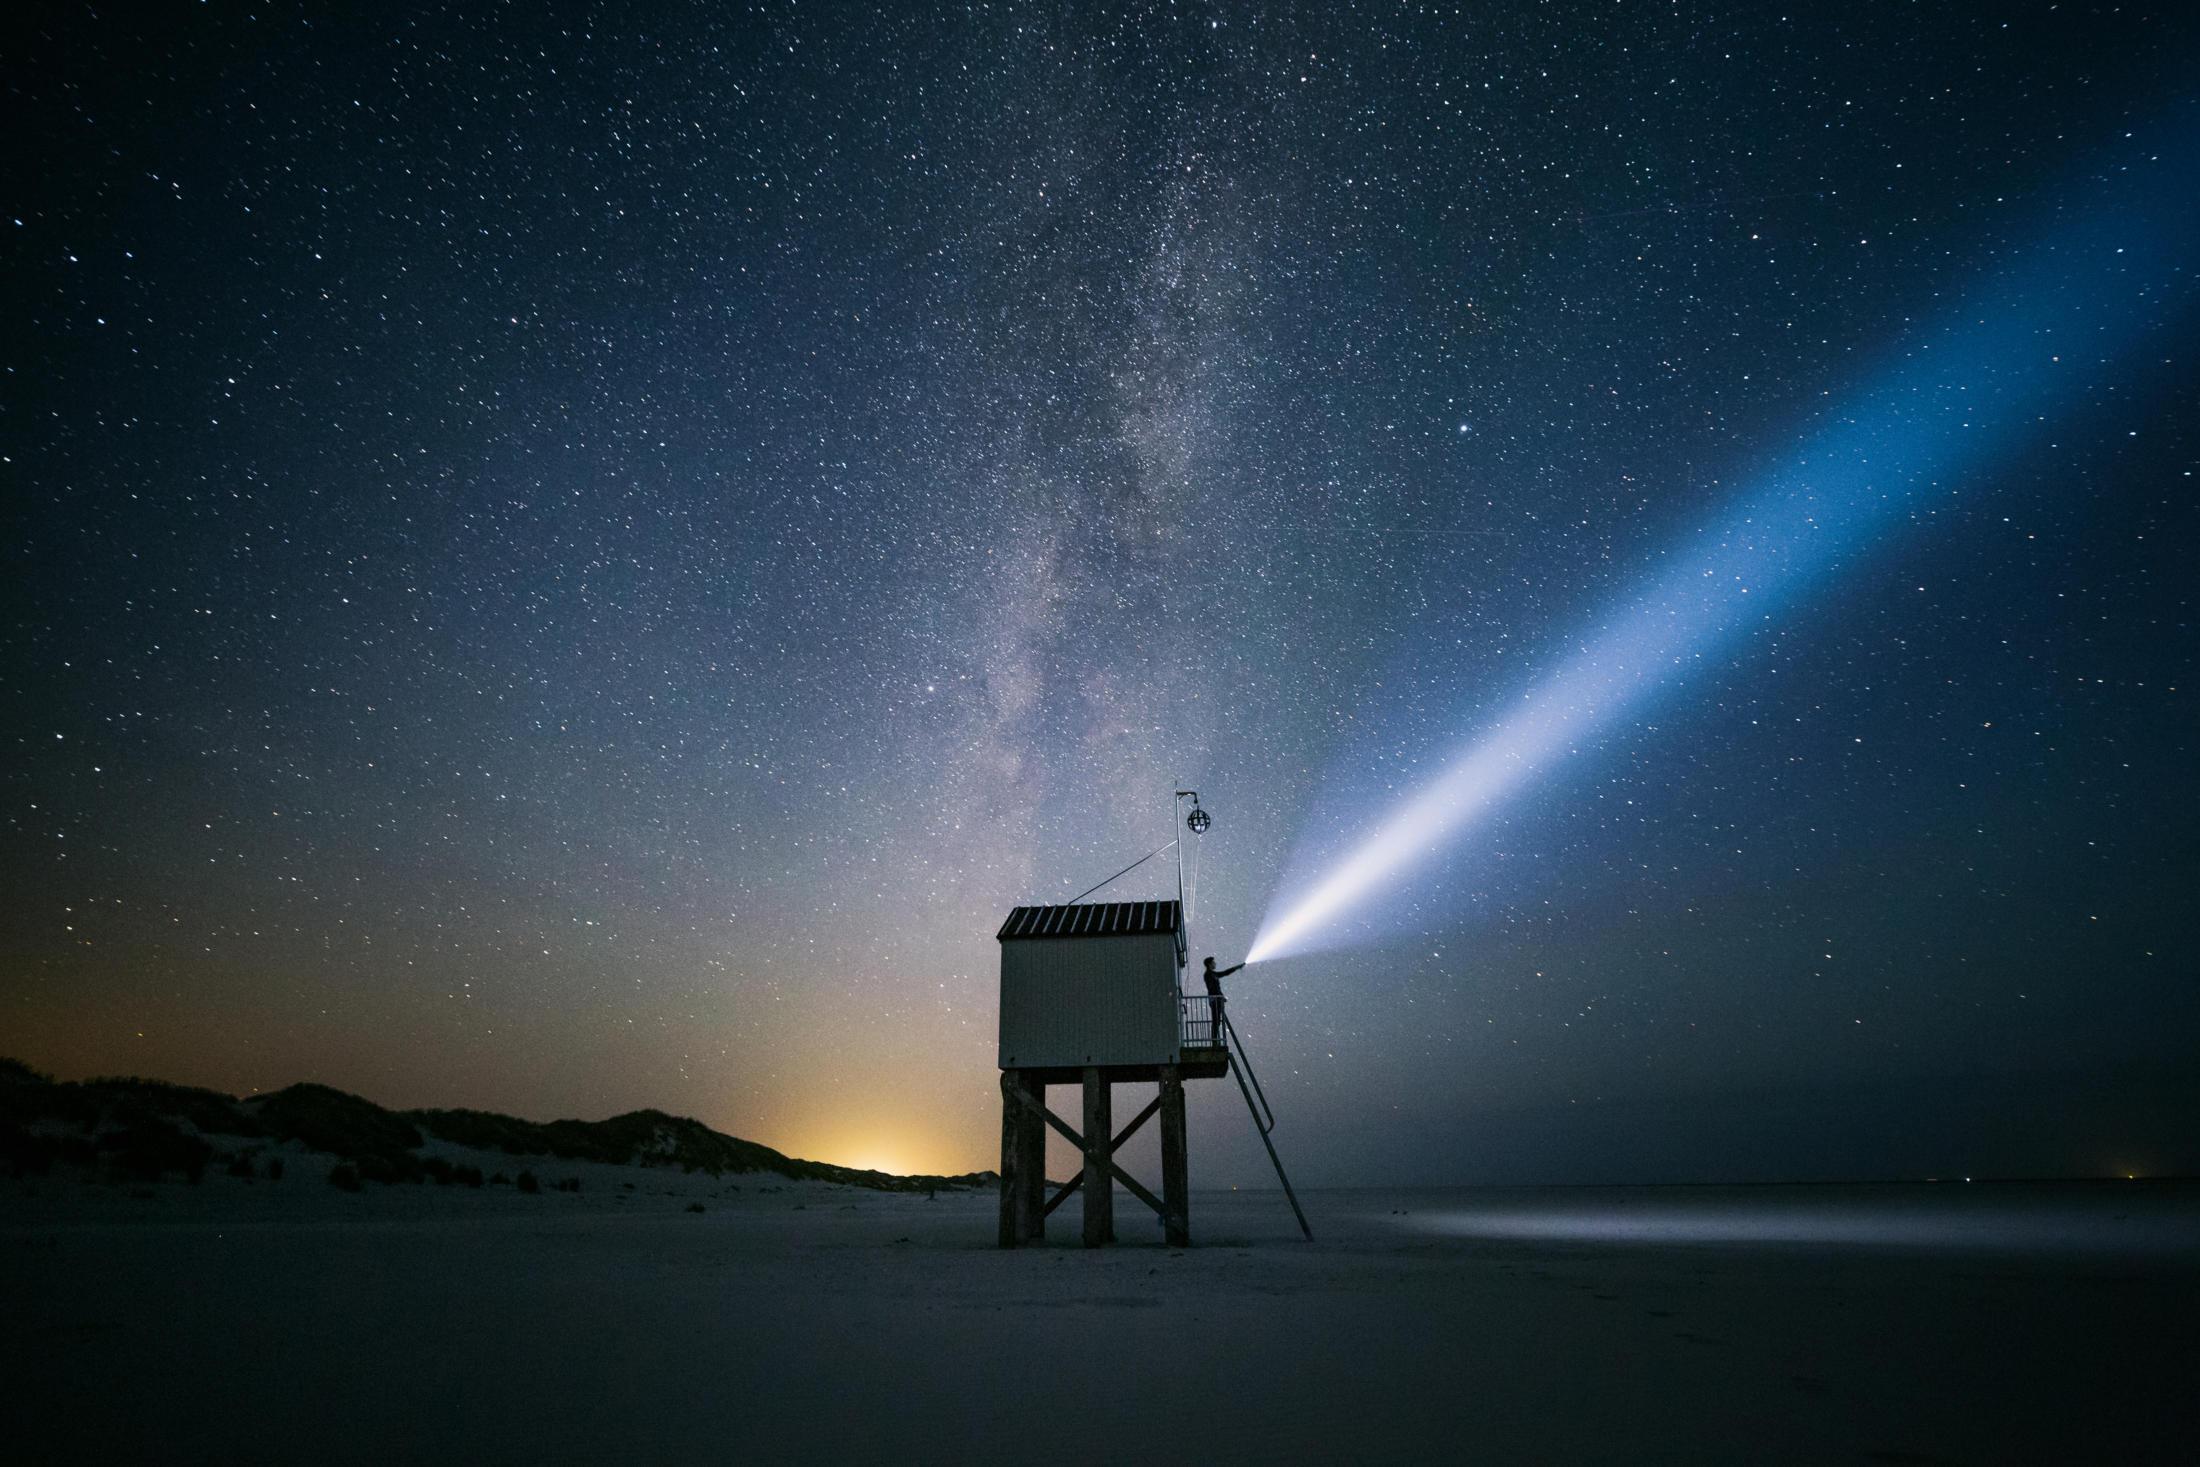 drenkelinghuis and starry sky